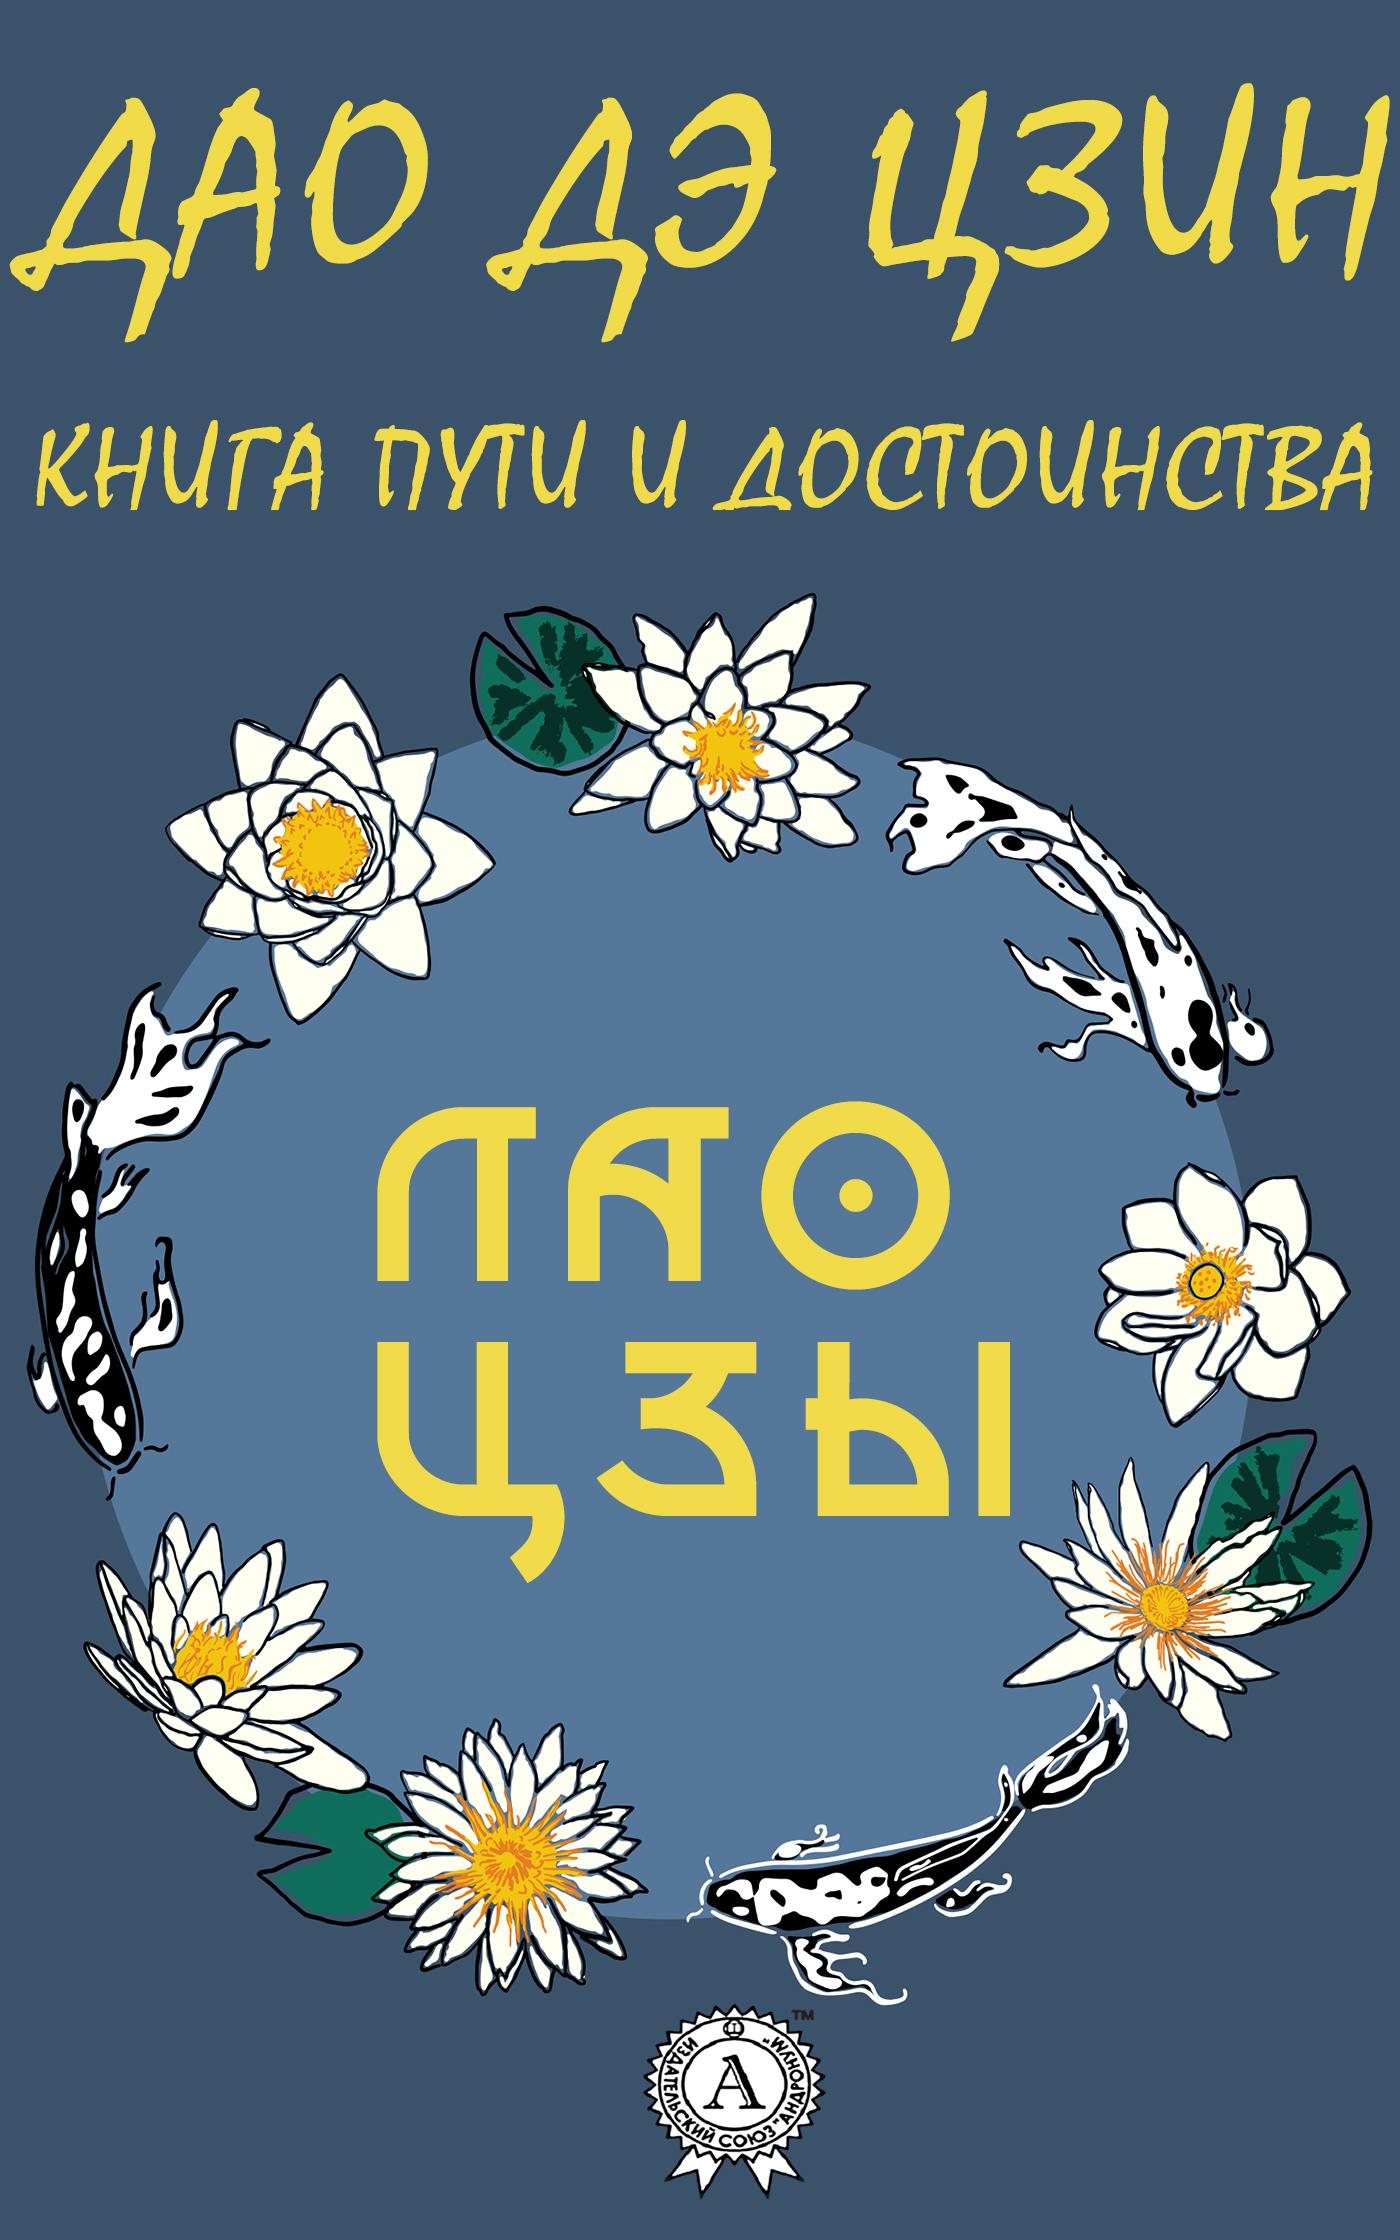 Лао-цзи Дао де цзин. Книга пути и достоинства